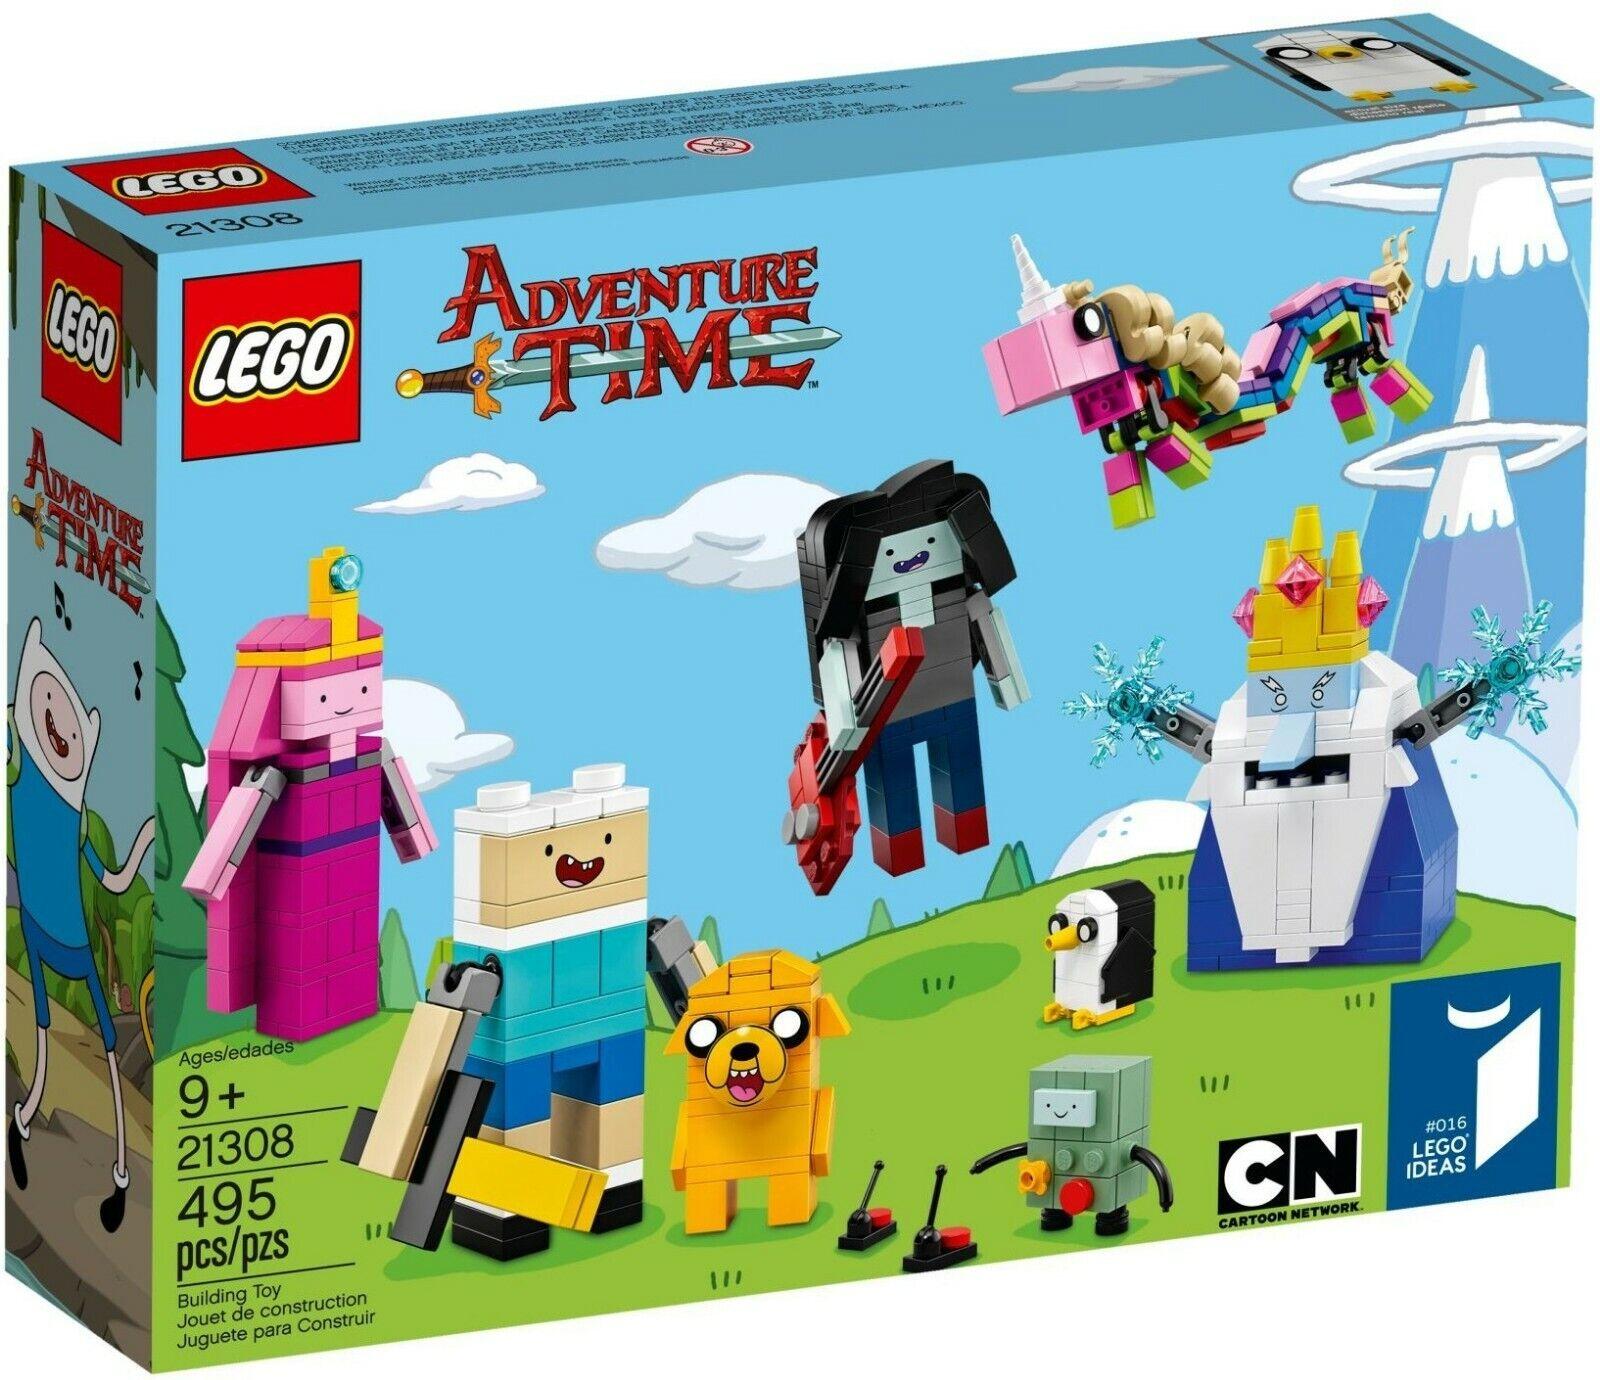 LEGO 21308 - Ideas - Adventure Time (Brick Build Figures Cartoon Network)